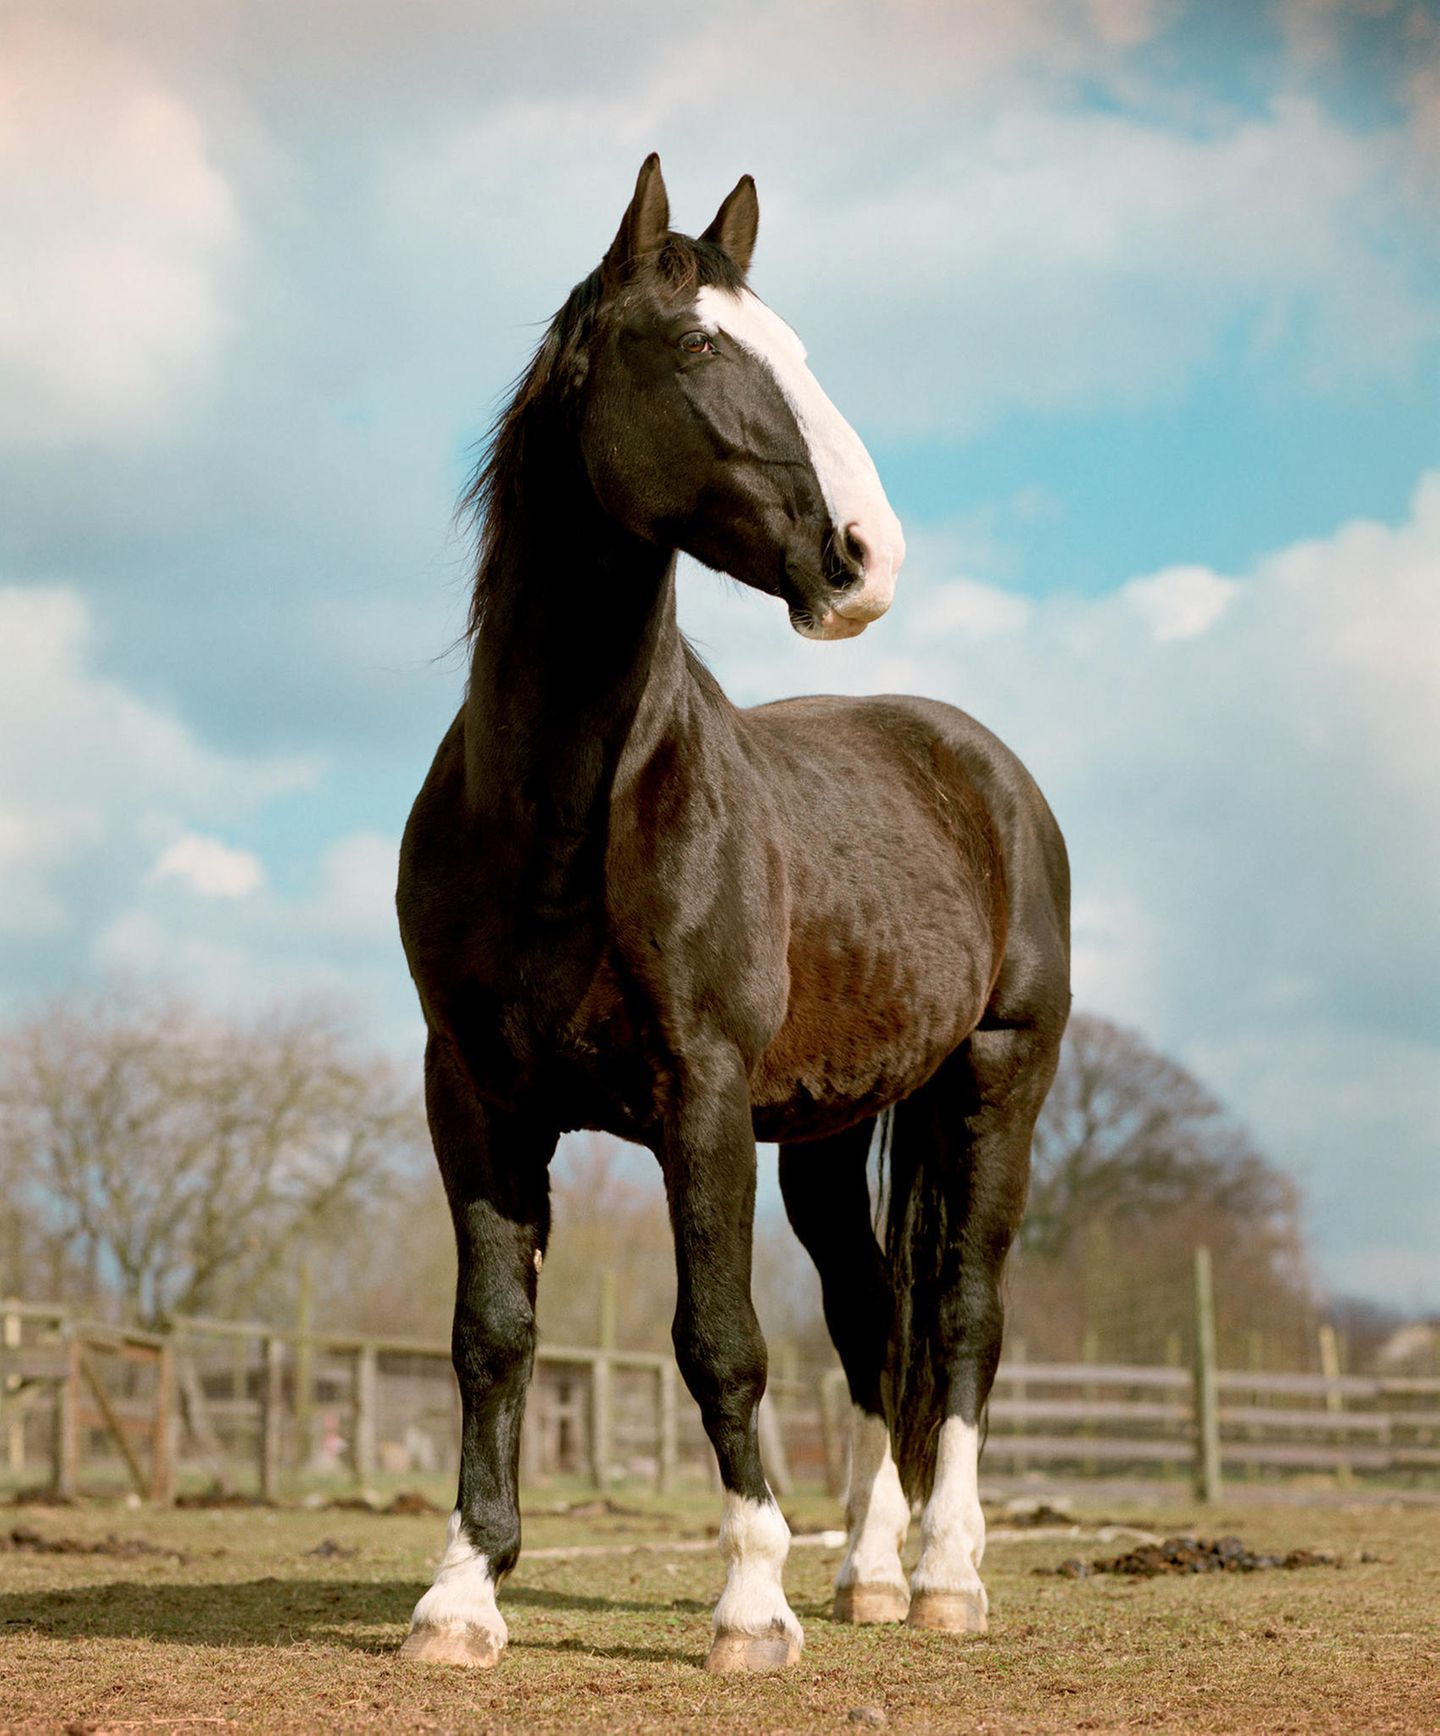 Tiere, die bald aussterben: Pferd